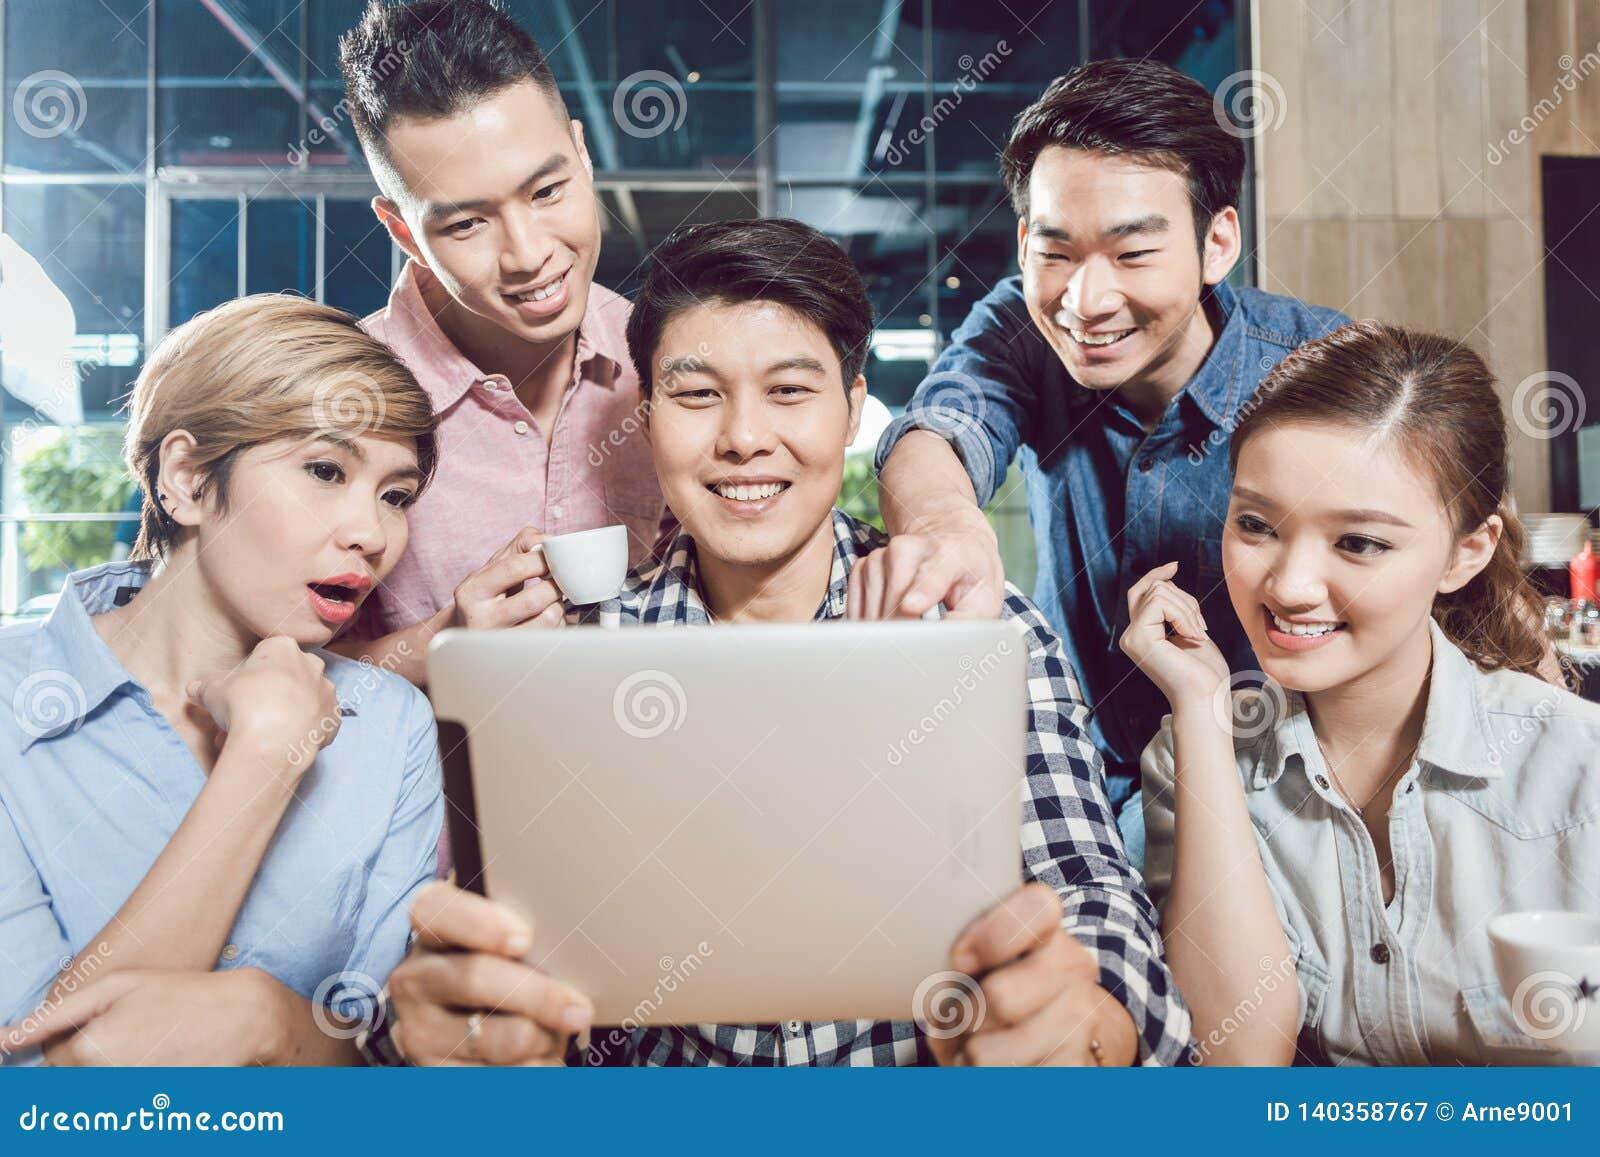 Group of friends enjoying on digital tablet